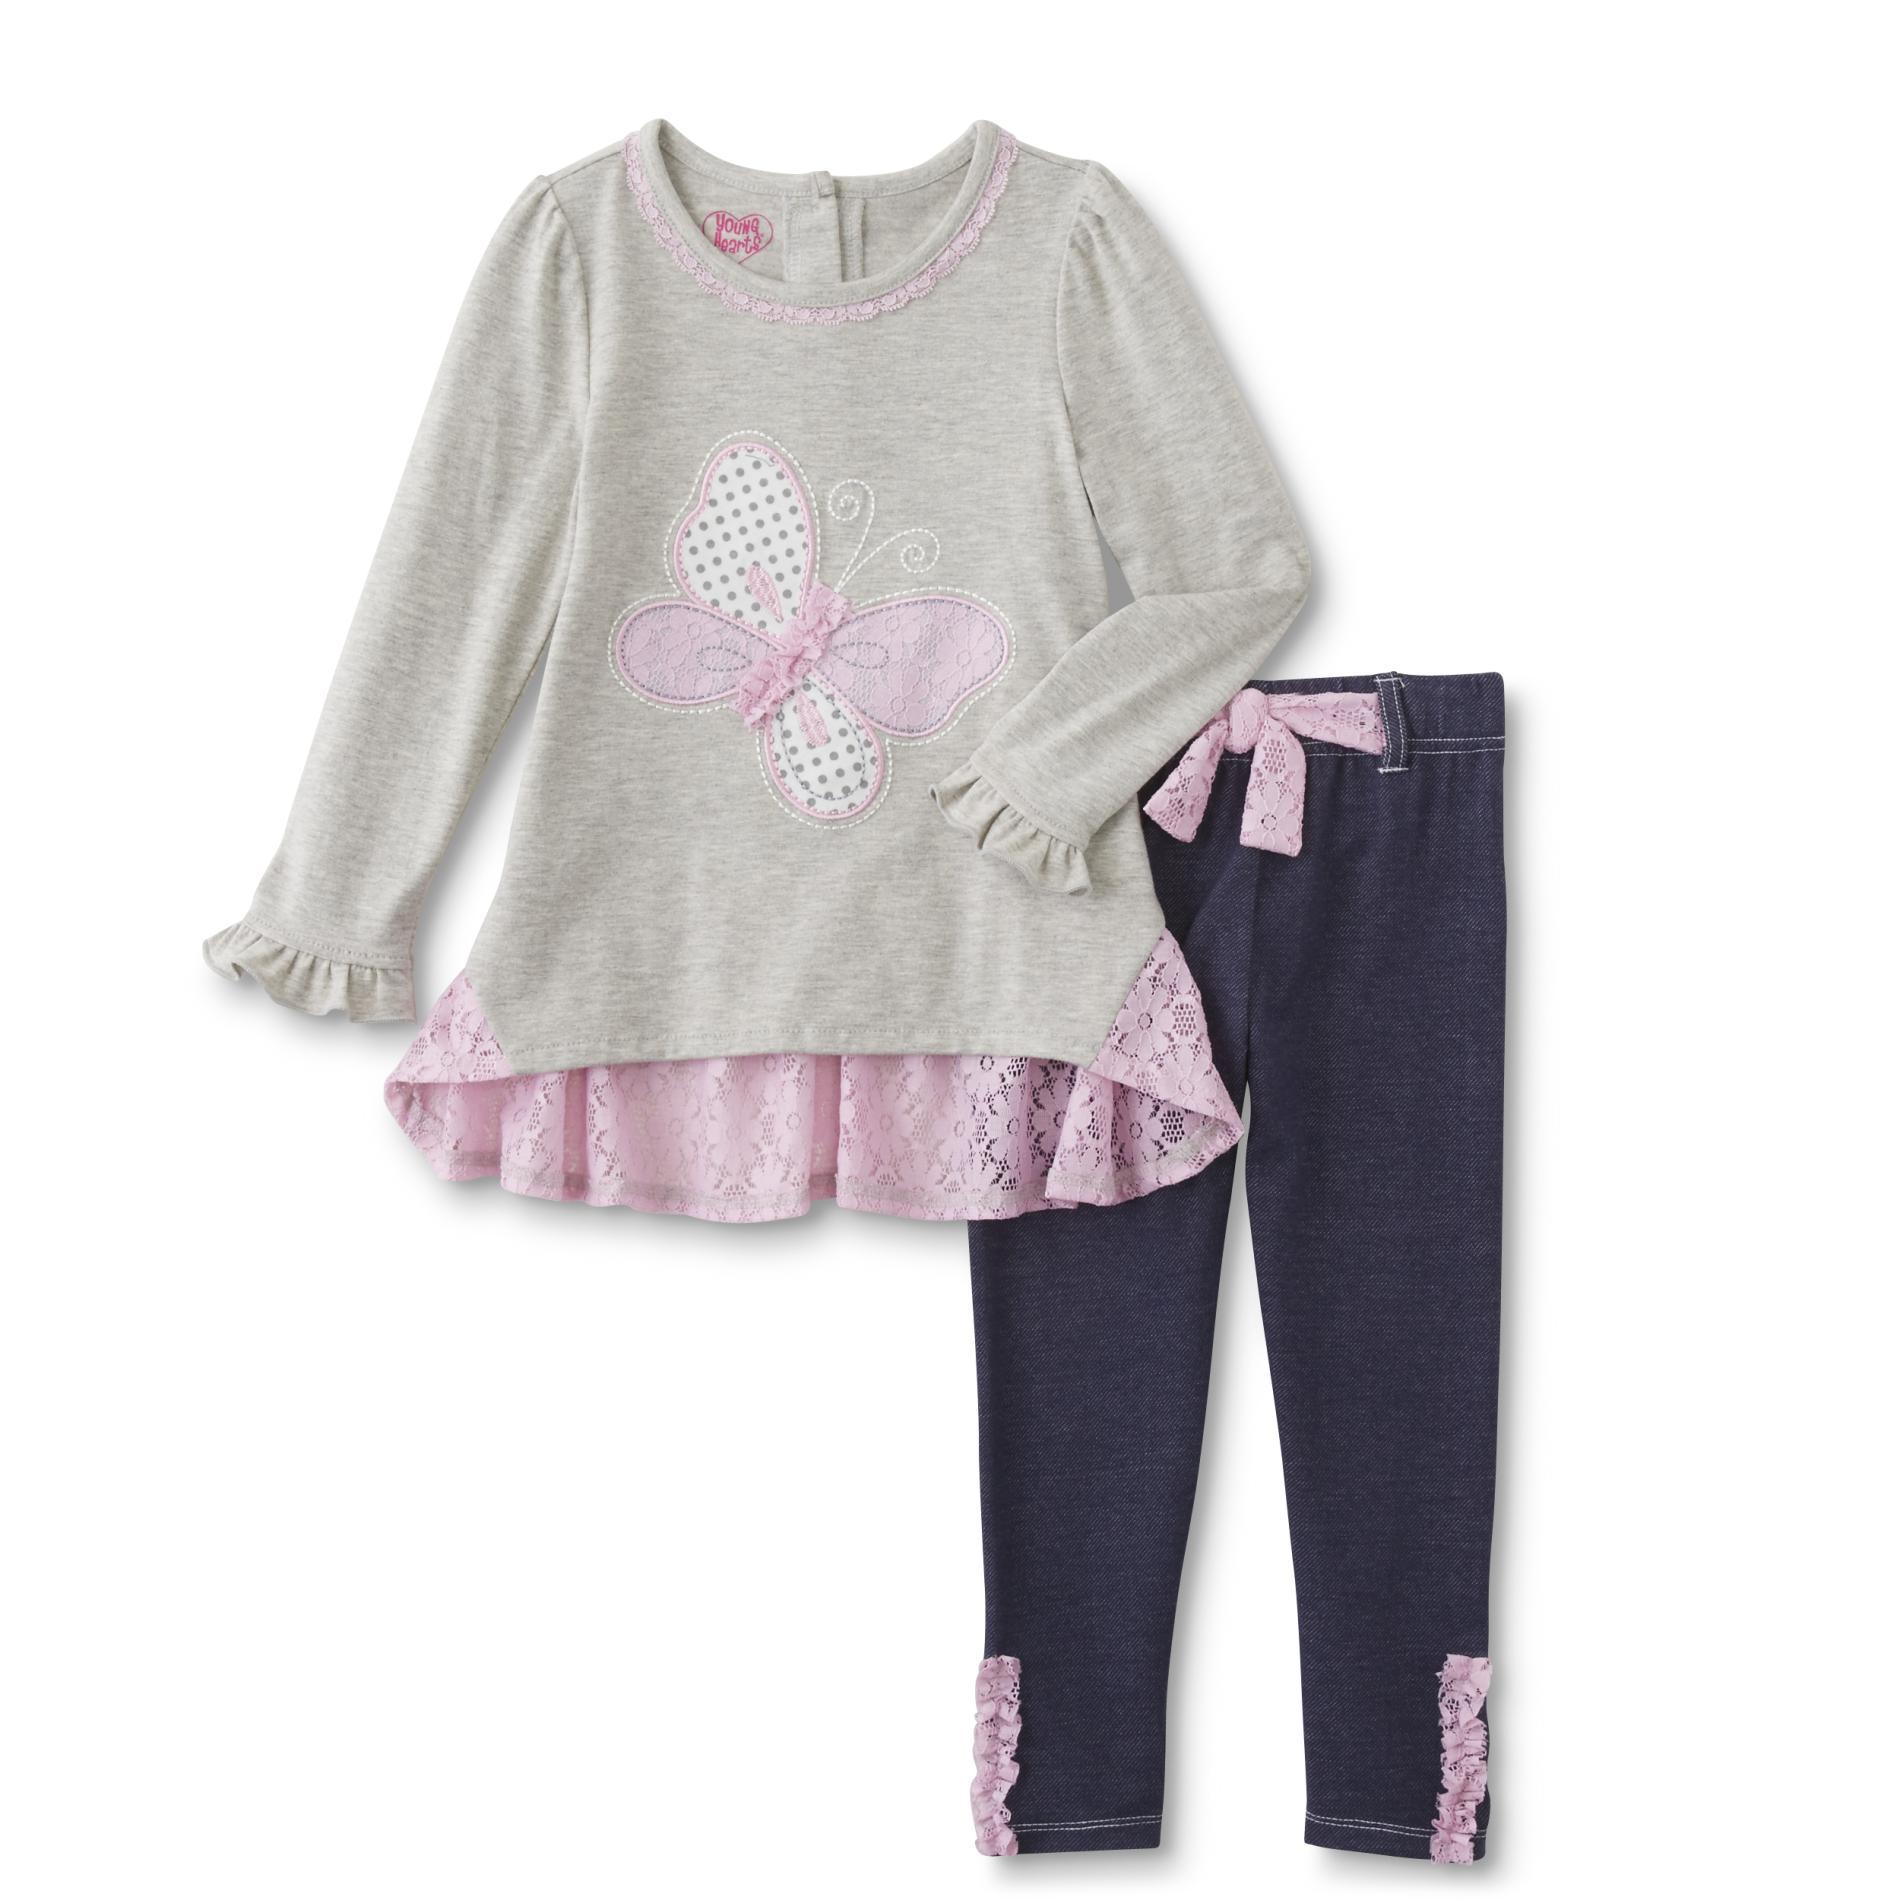 Infant & Toddler Girl's Long-Sleeve Top & Jeggings - Butterfly